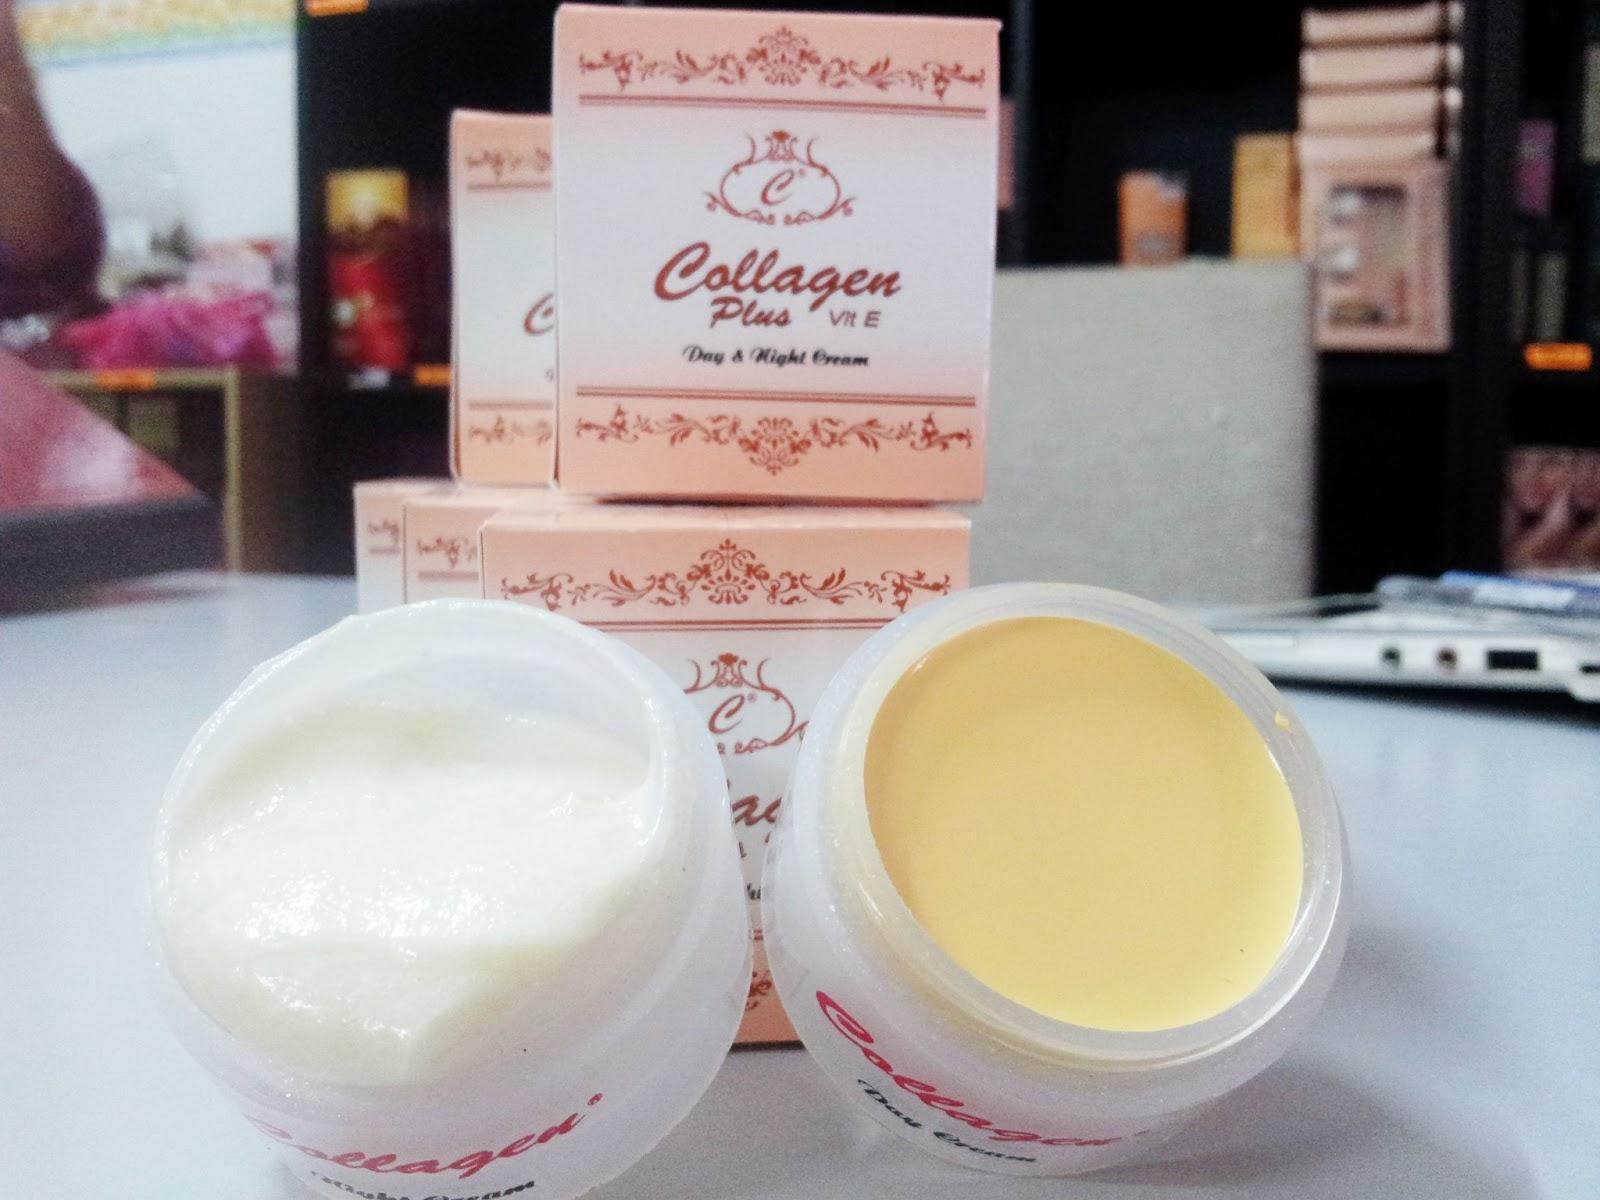 E collagen